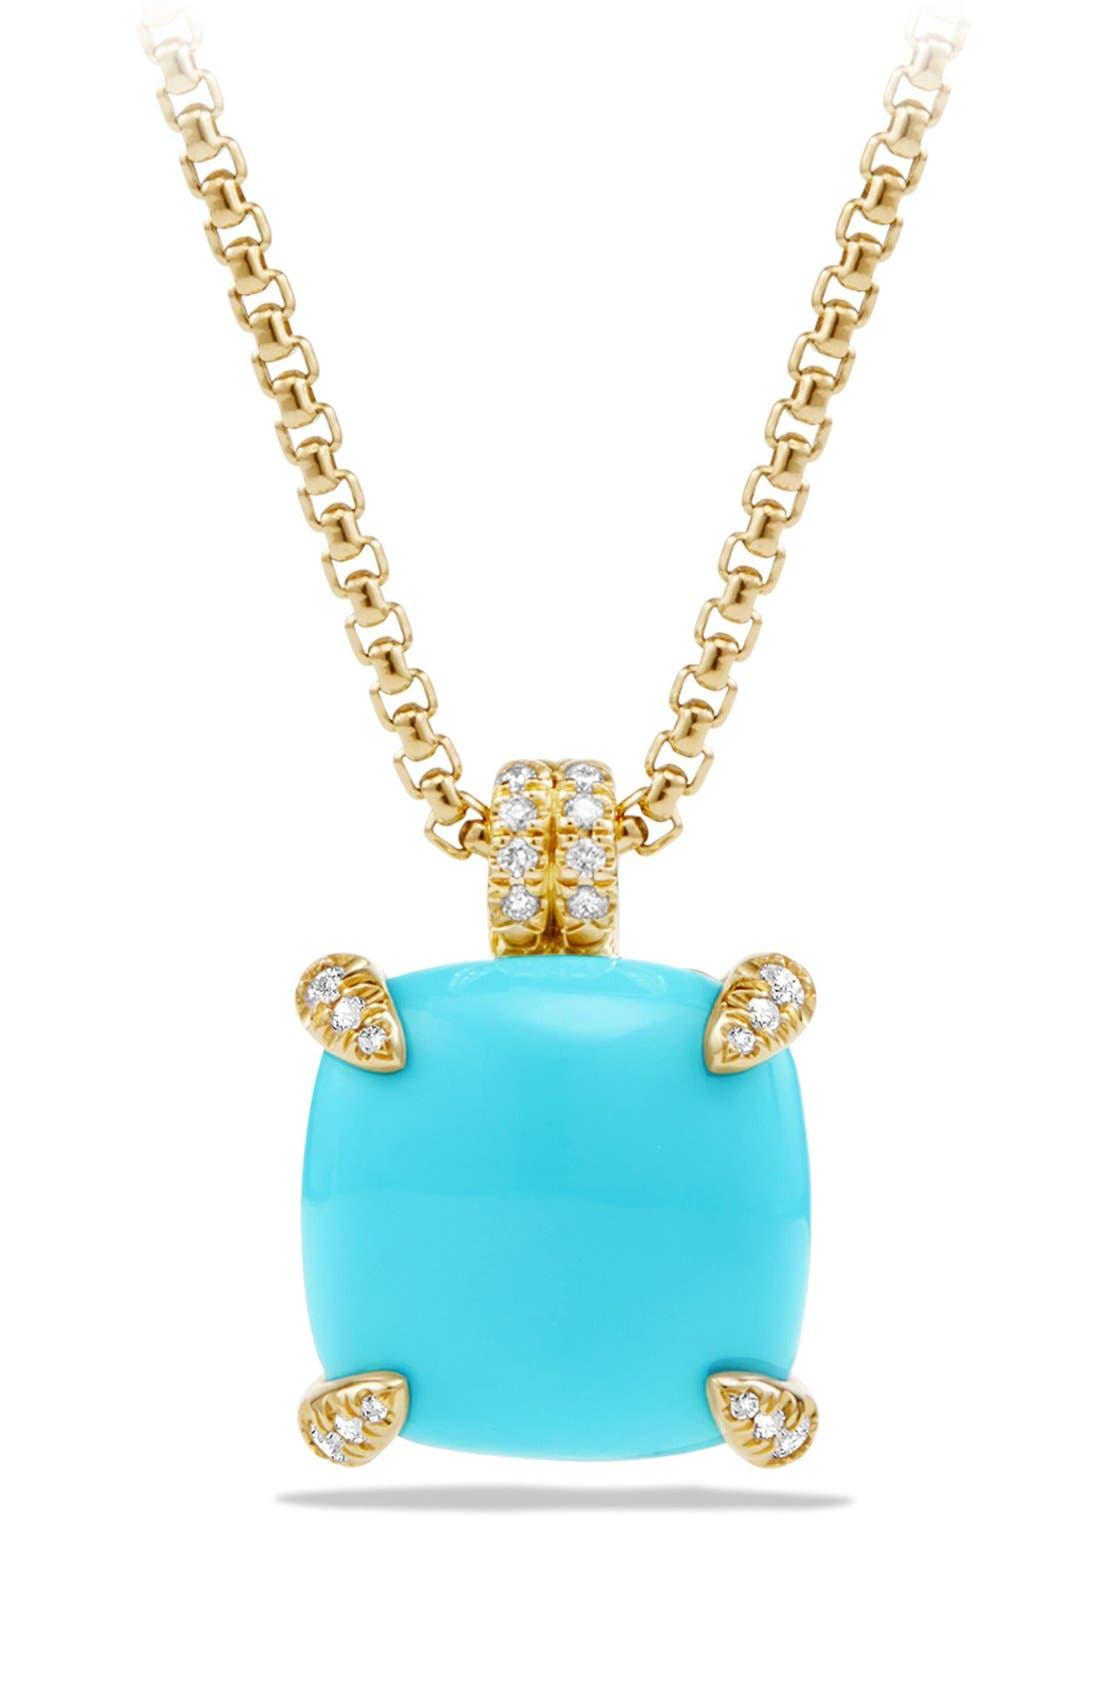 DAVID YURMAN Châtelaine Pendant Necklace with Diamonds in 18K Gold